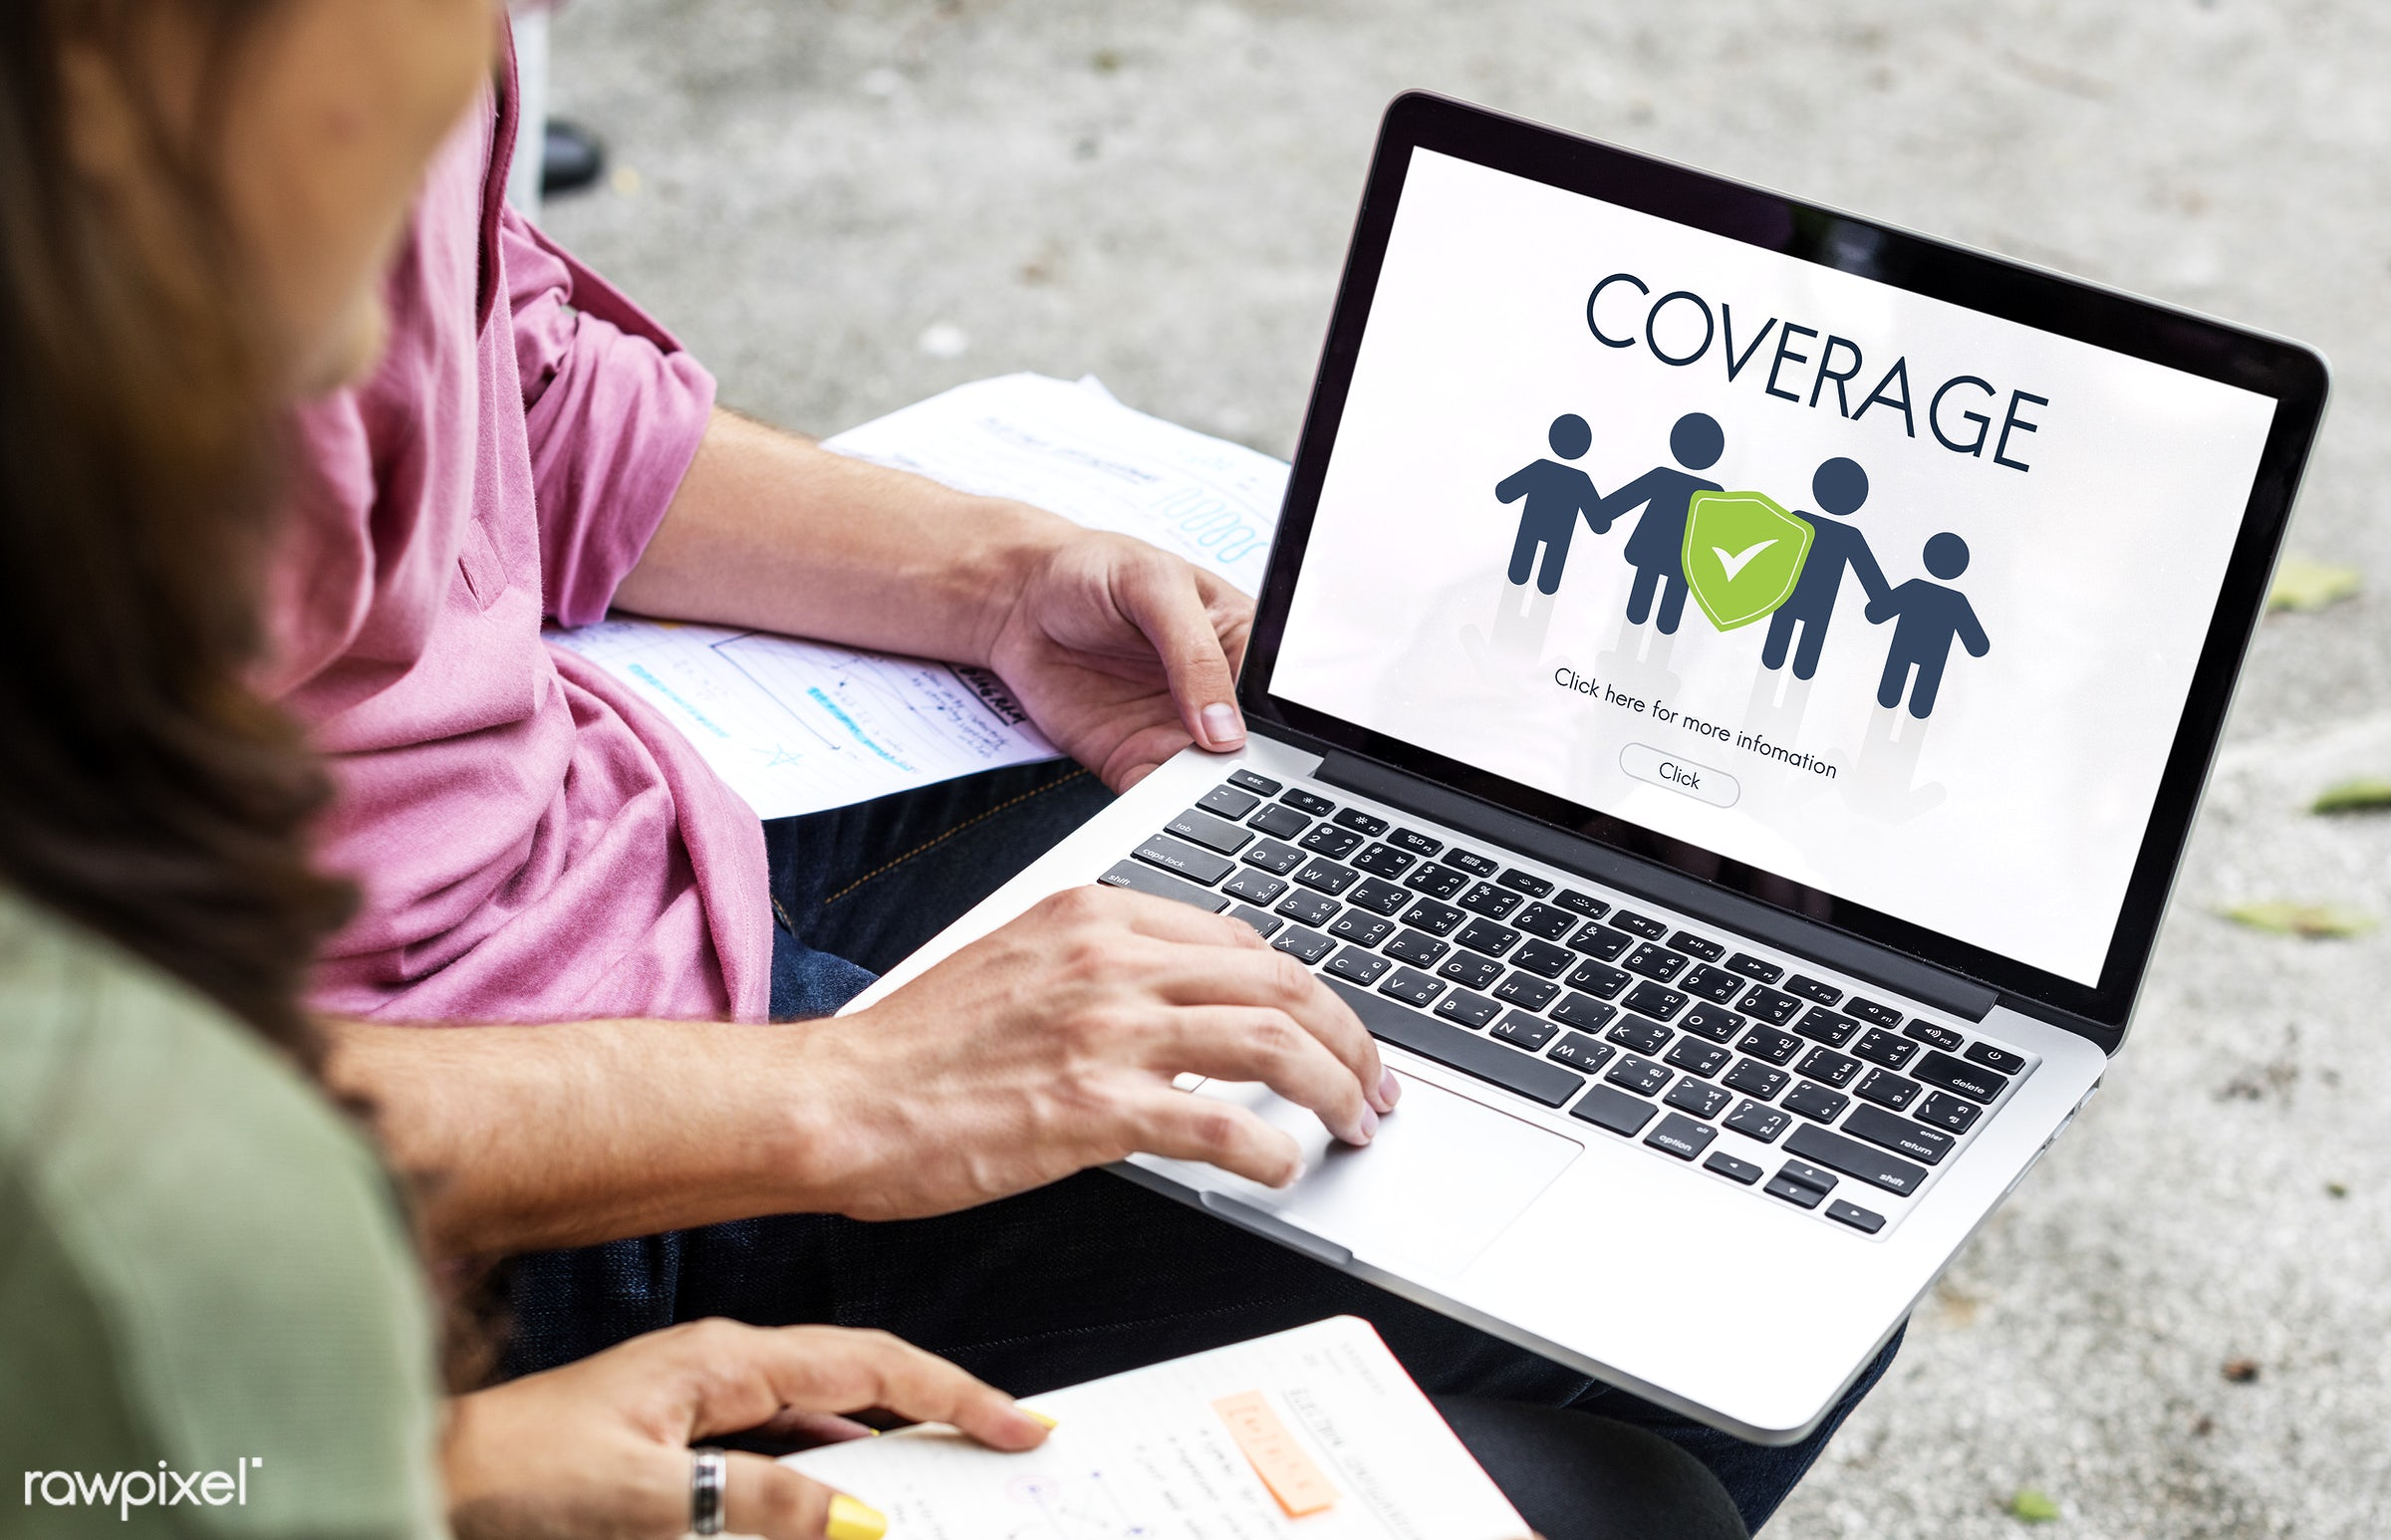 accident insurance, asian, benefit, benefits, browsing, budget, cash, caucasian, coverage, devices, diversity, enjoyment,...